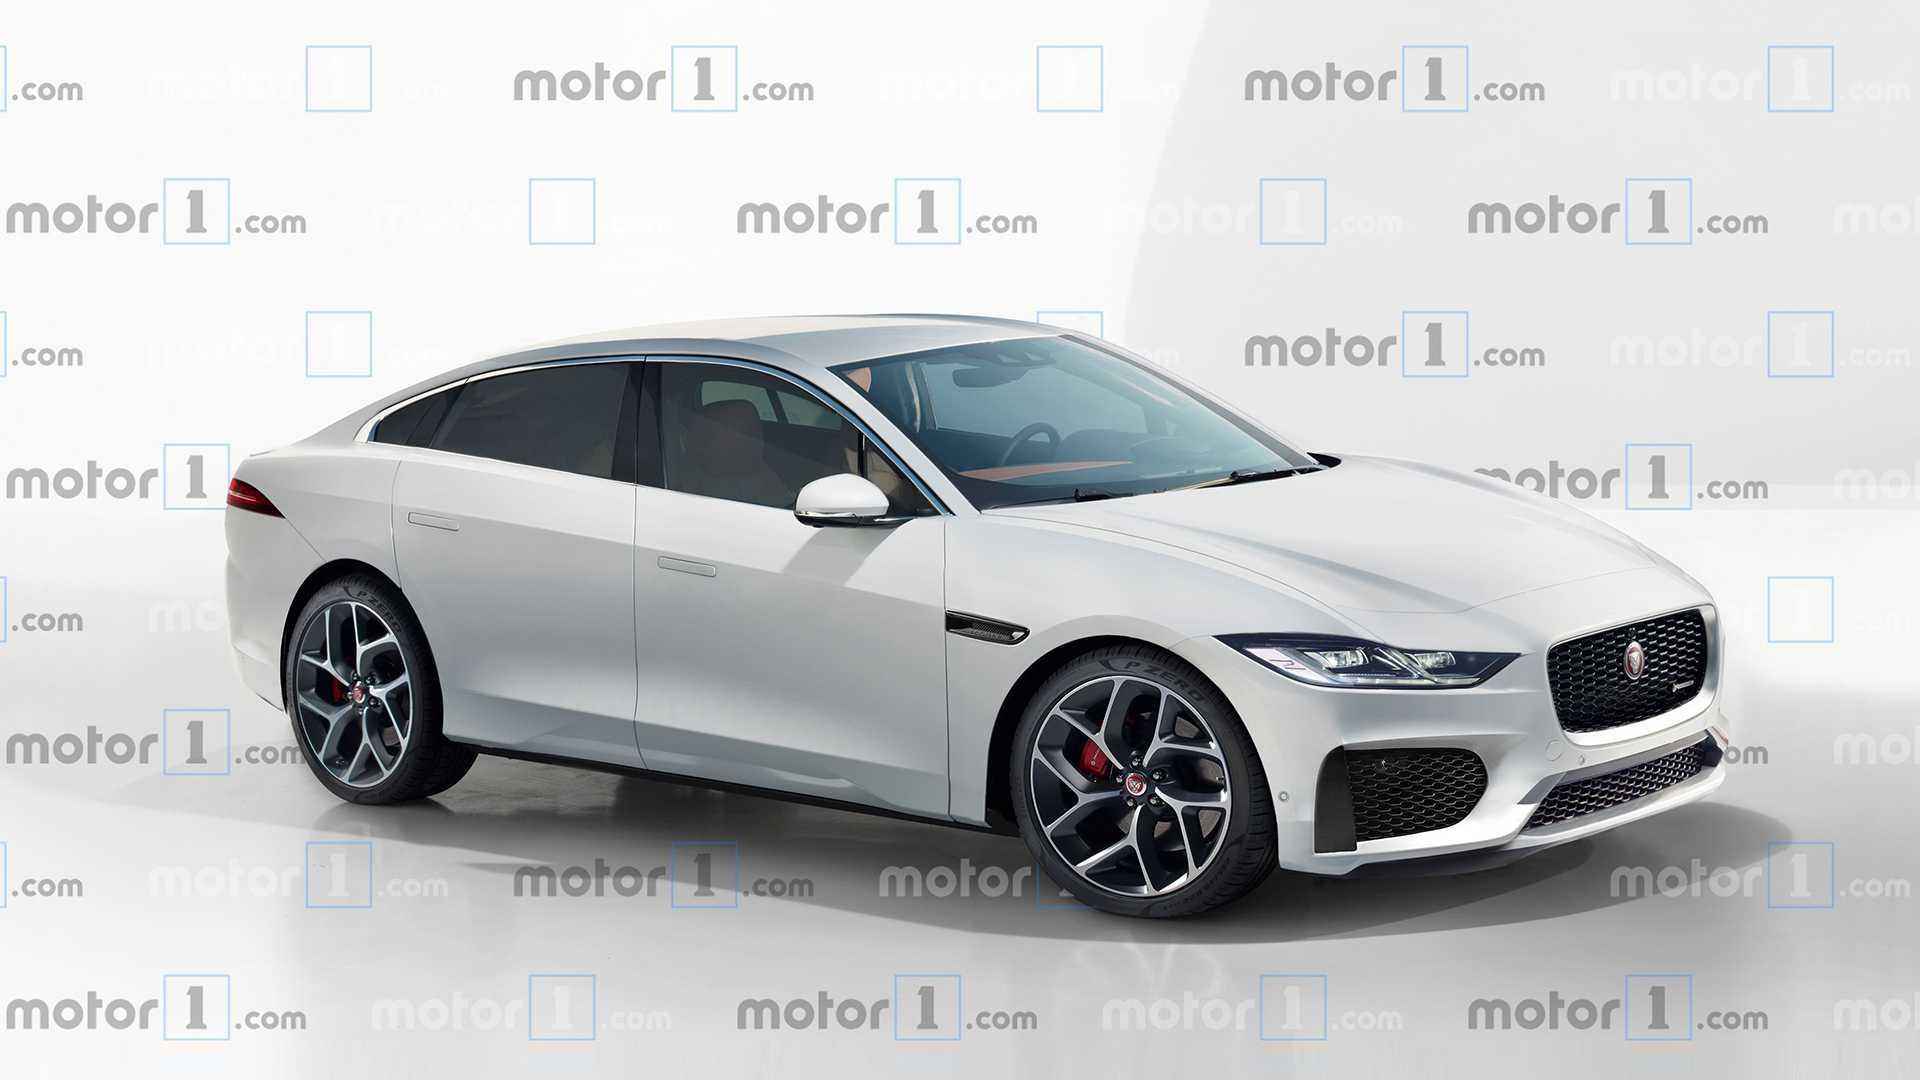 33 All New Jaguar Xe Facelift 2020 Exterior for Jaguar Xe Facelift 2020